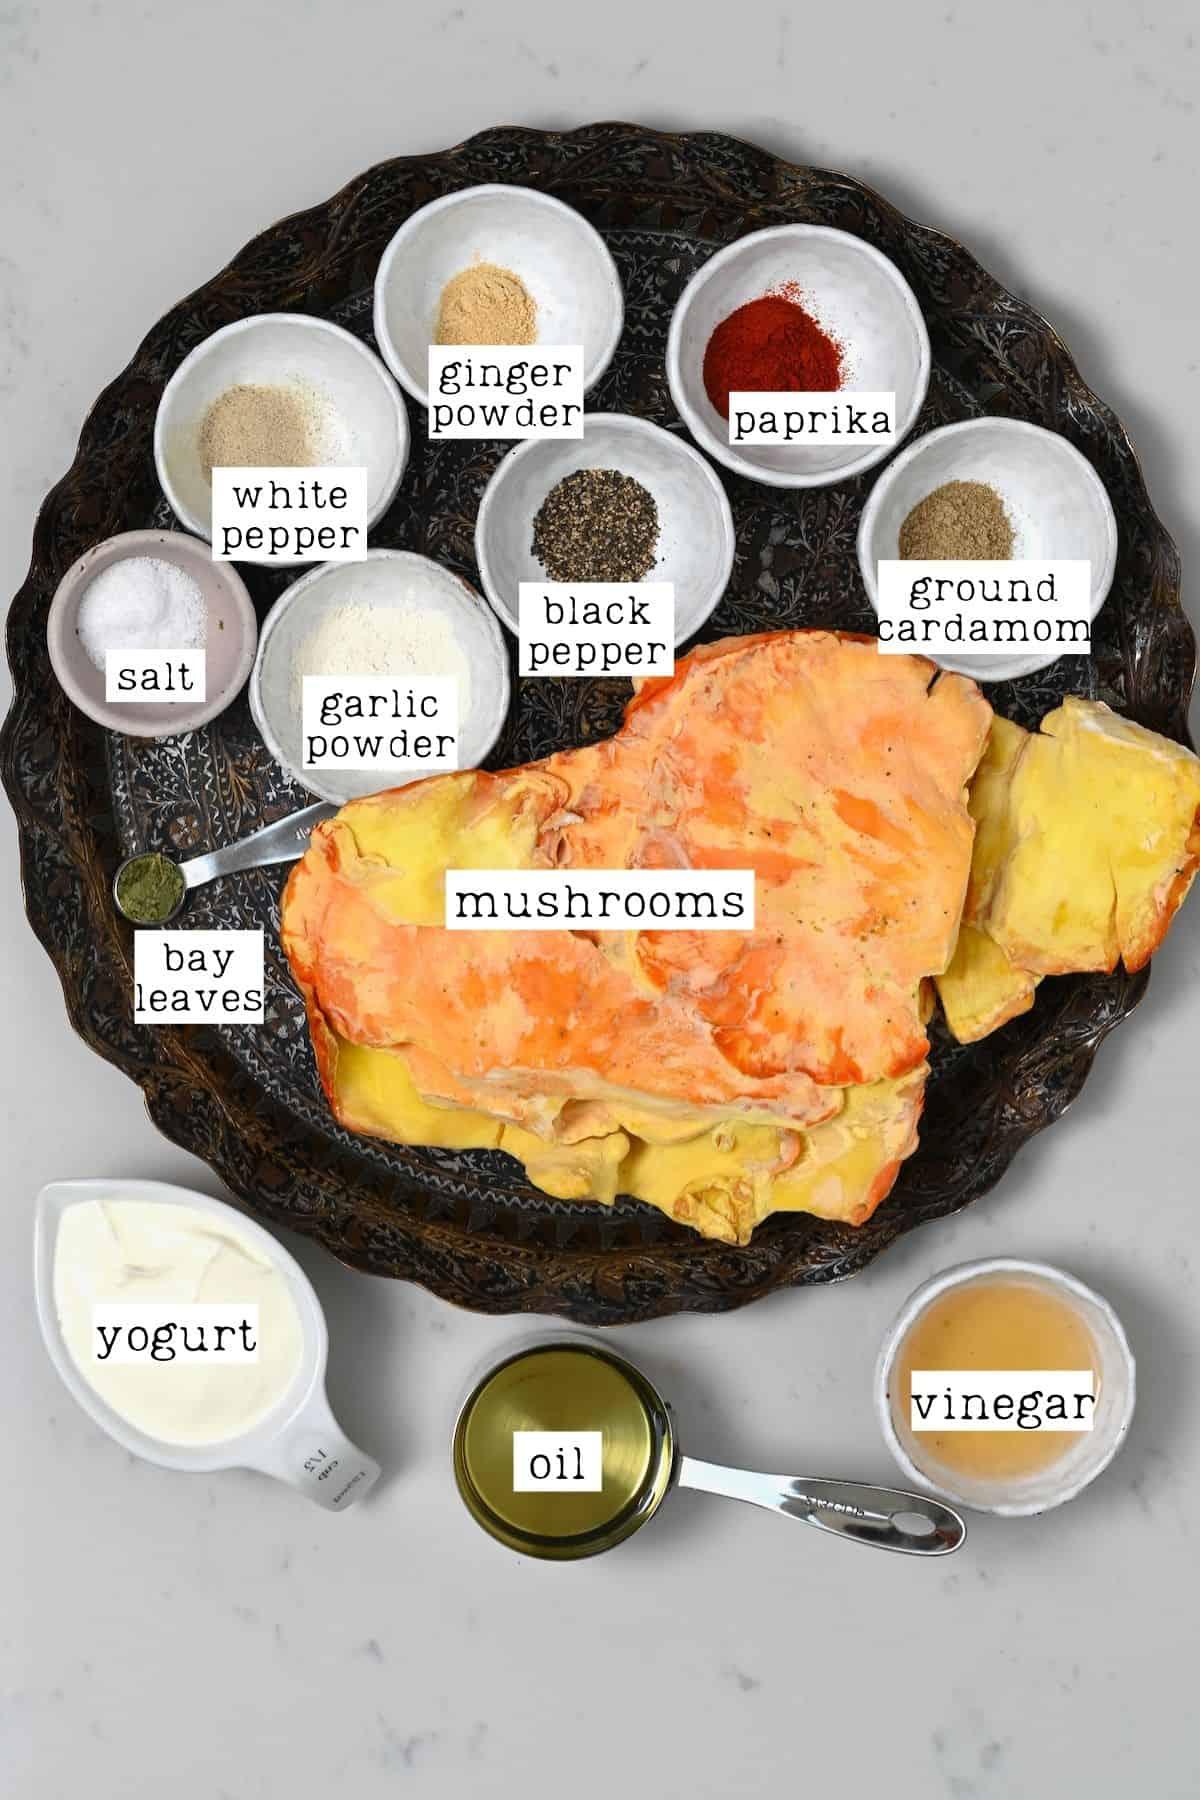 Ingredients for mushroom shawarma